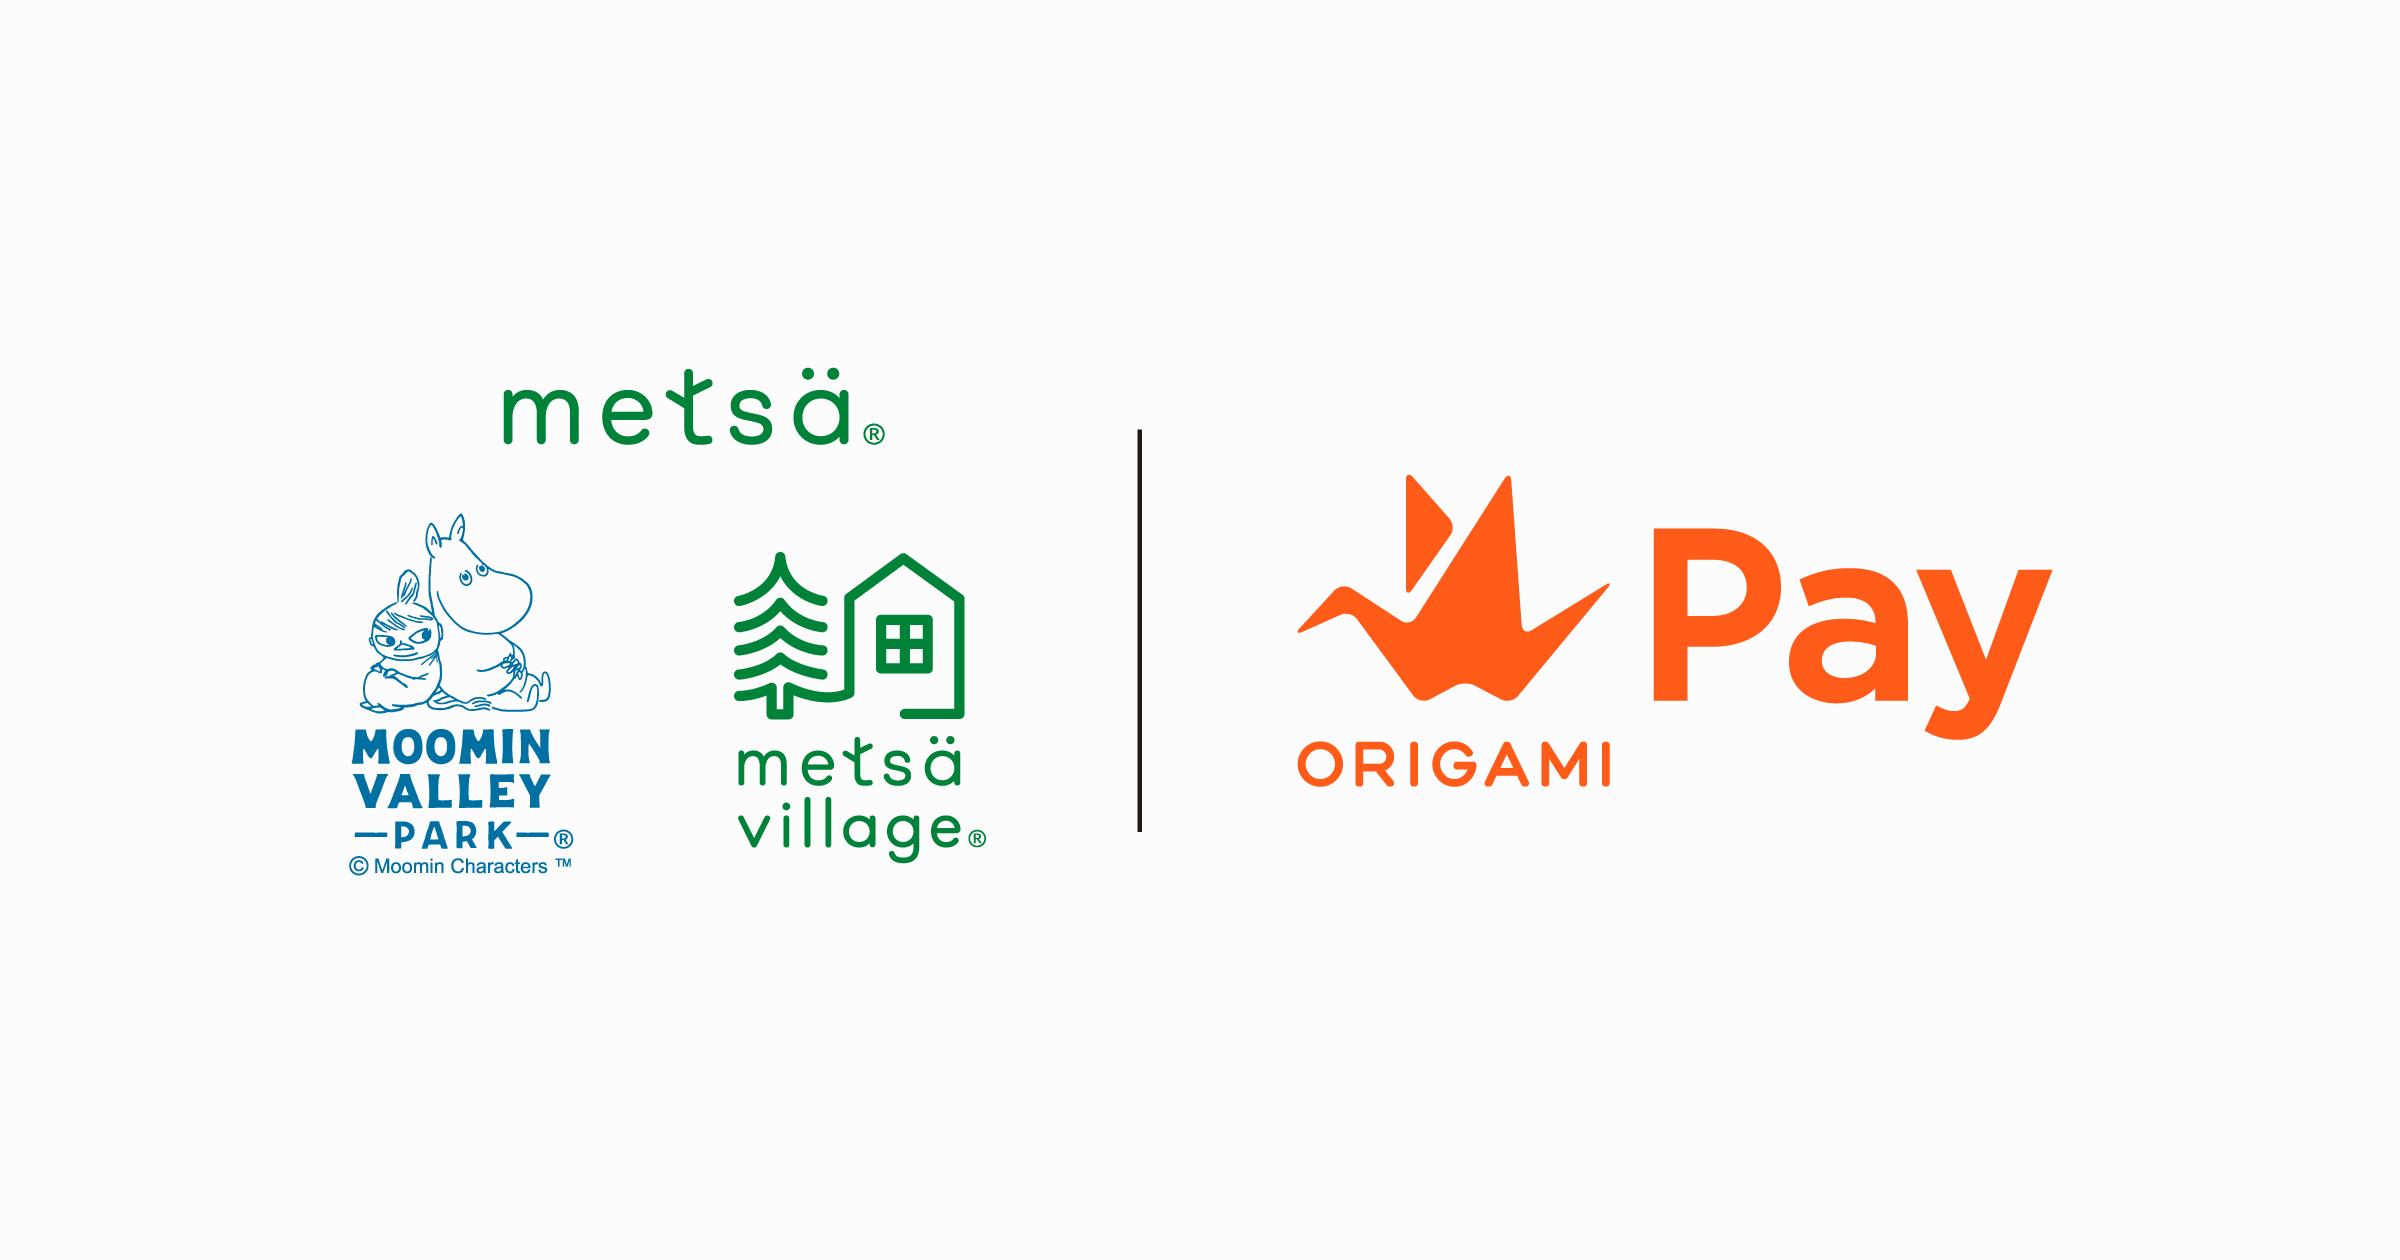 Origami Pay「ムーミンバレー」と隣接の「メッツァビレッジ」導入